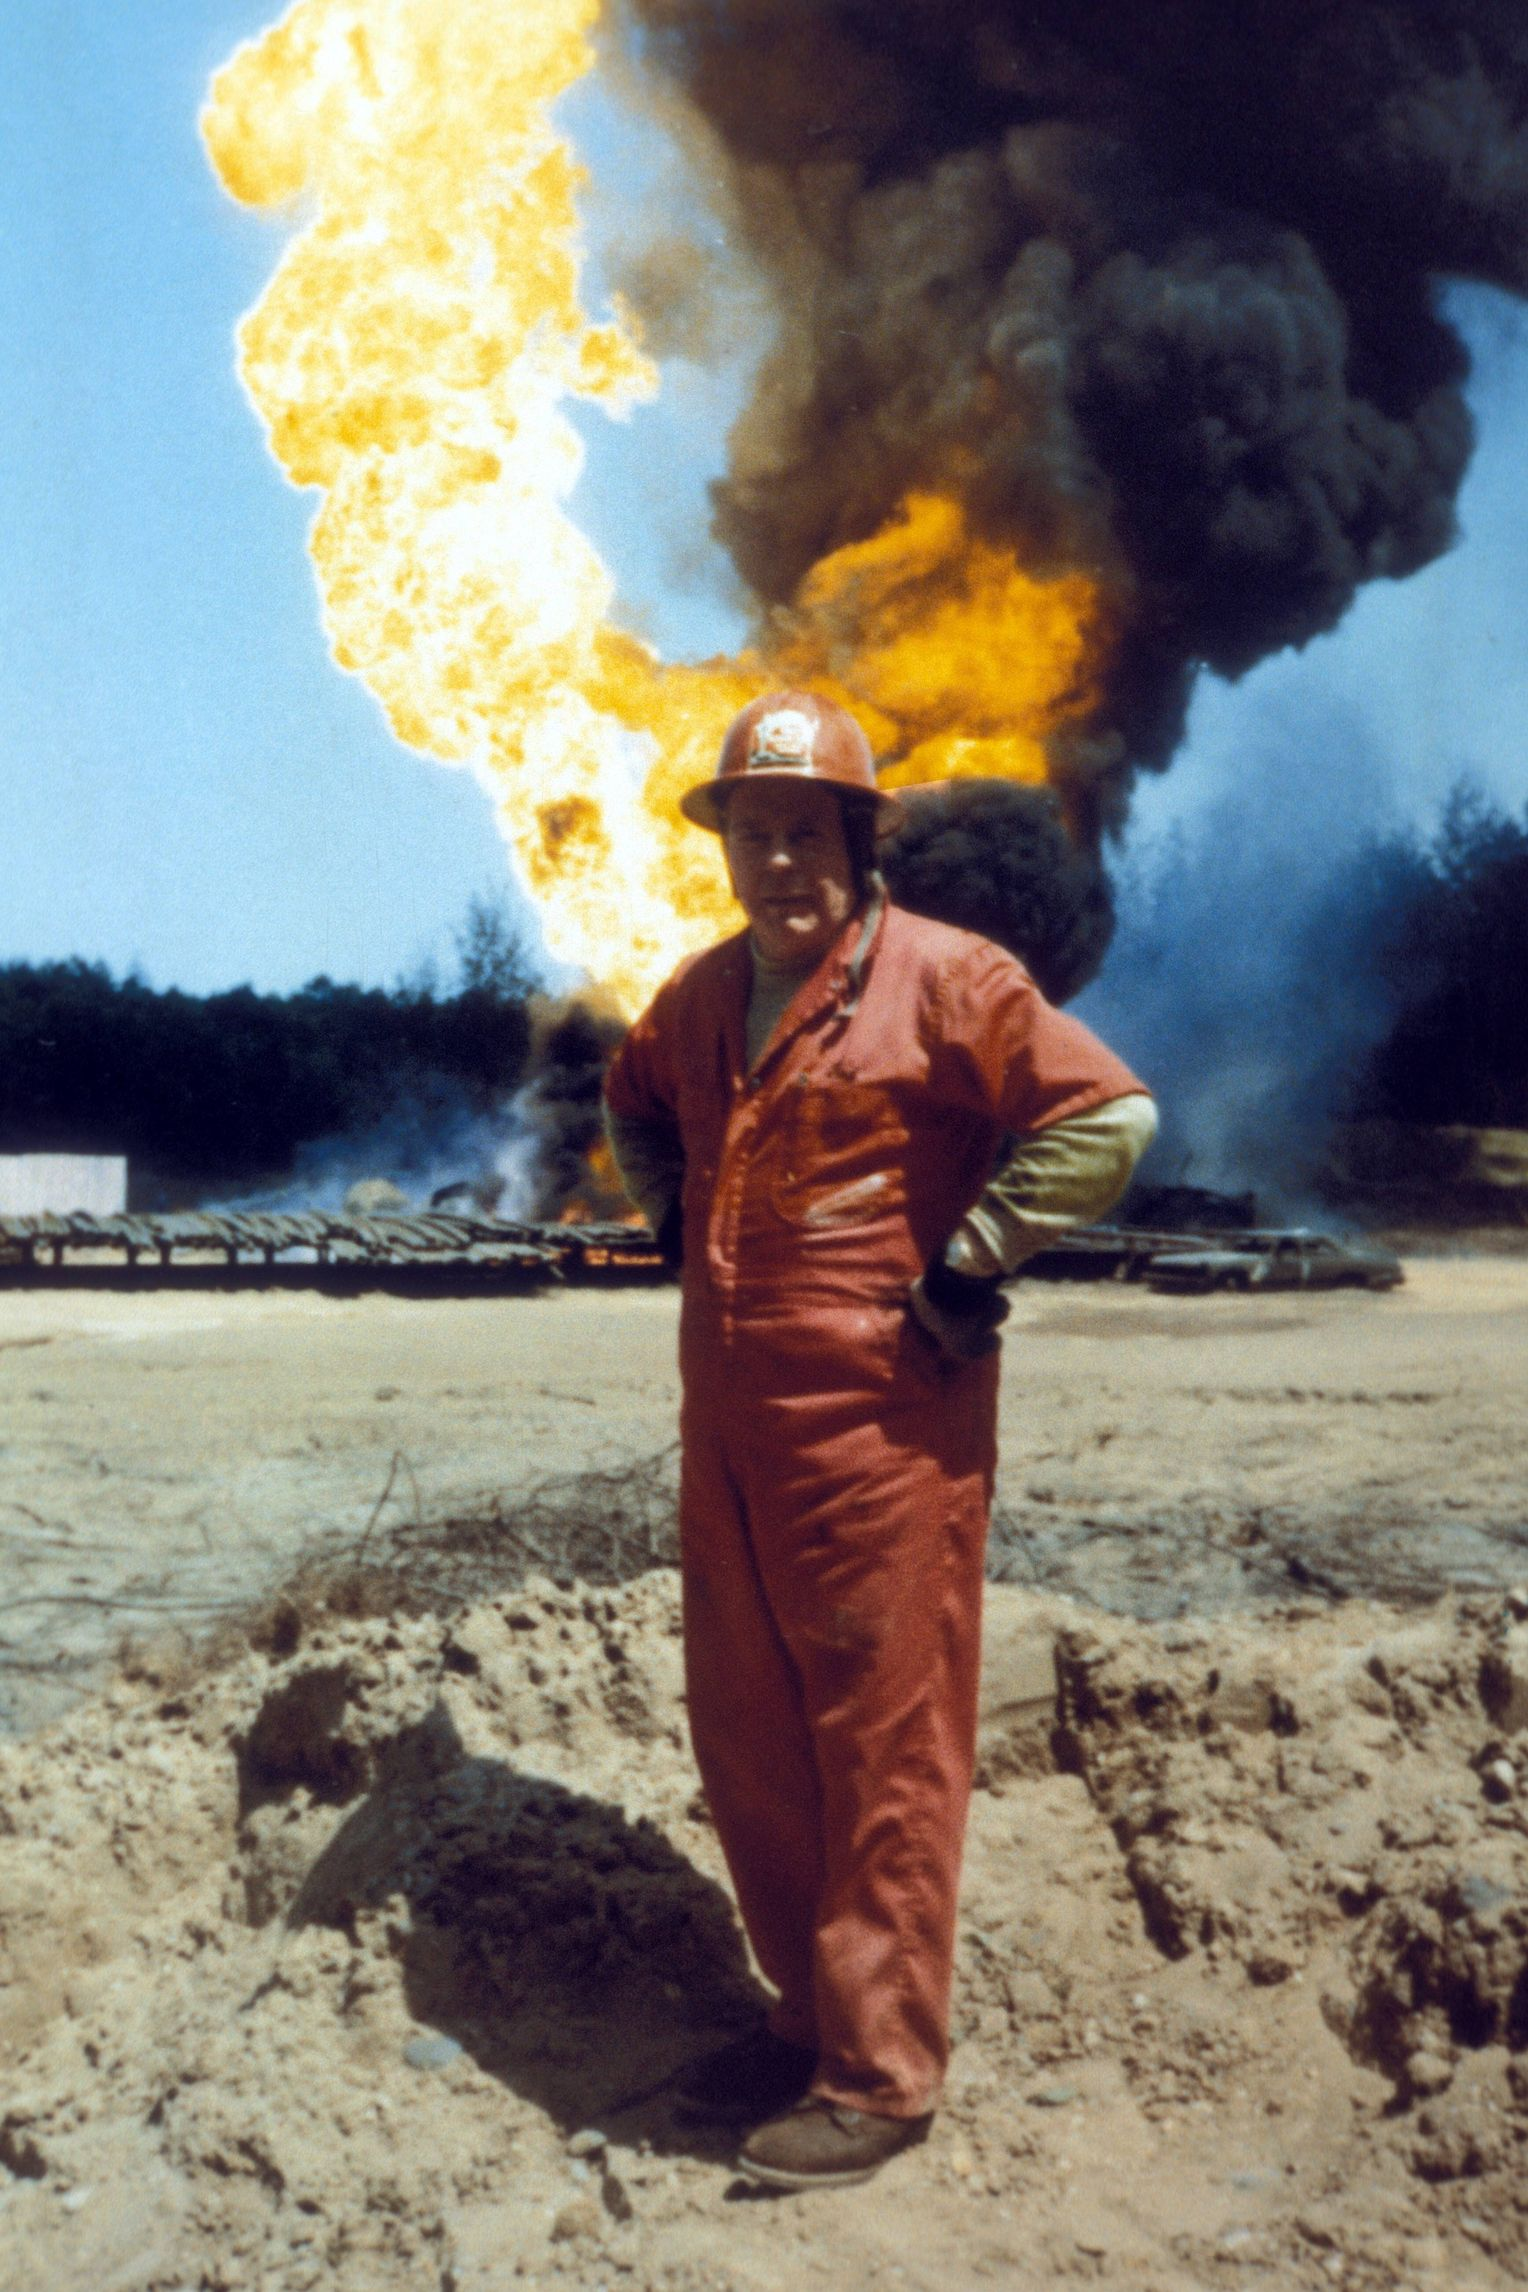 Red Adair: Berühmtester Feuerwehrmann der Welt - DER SPIEGEL